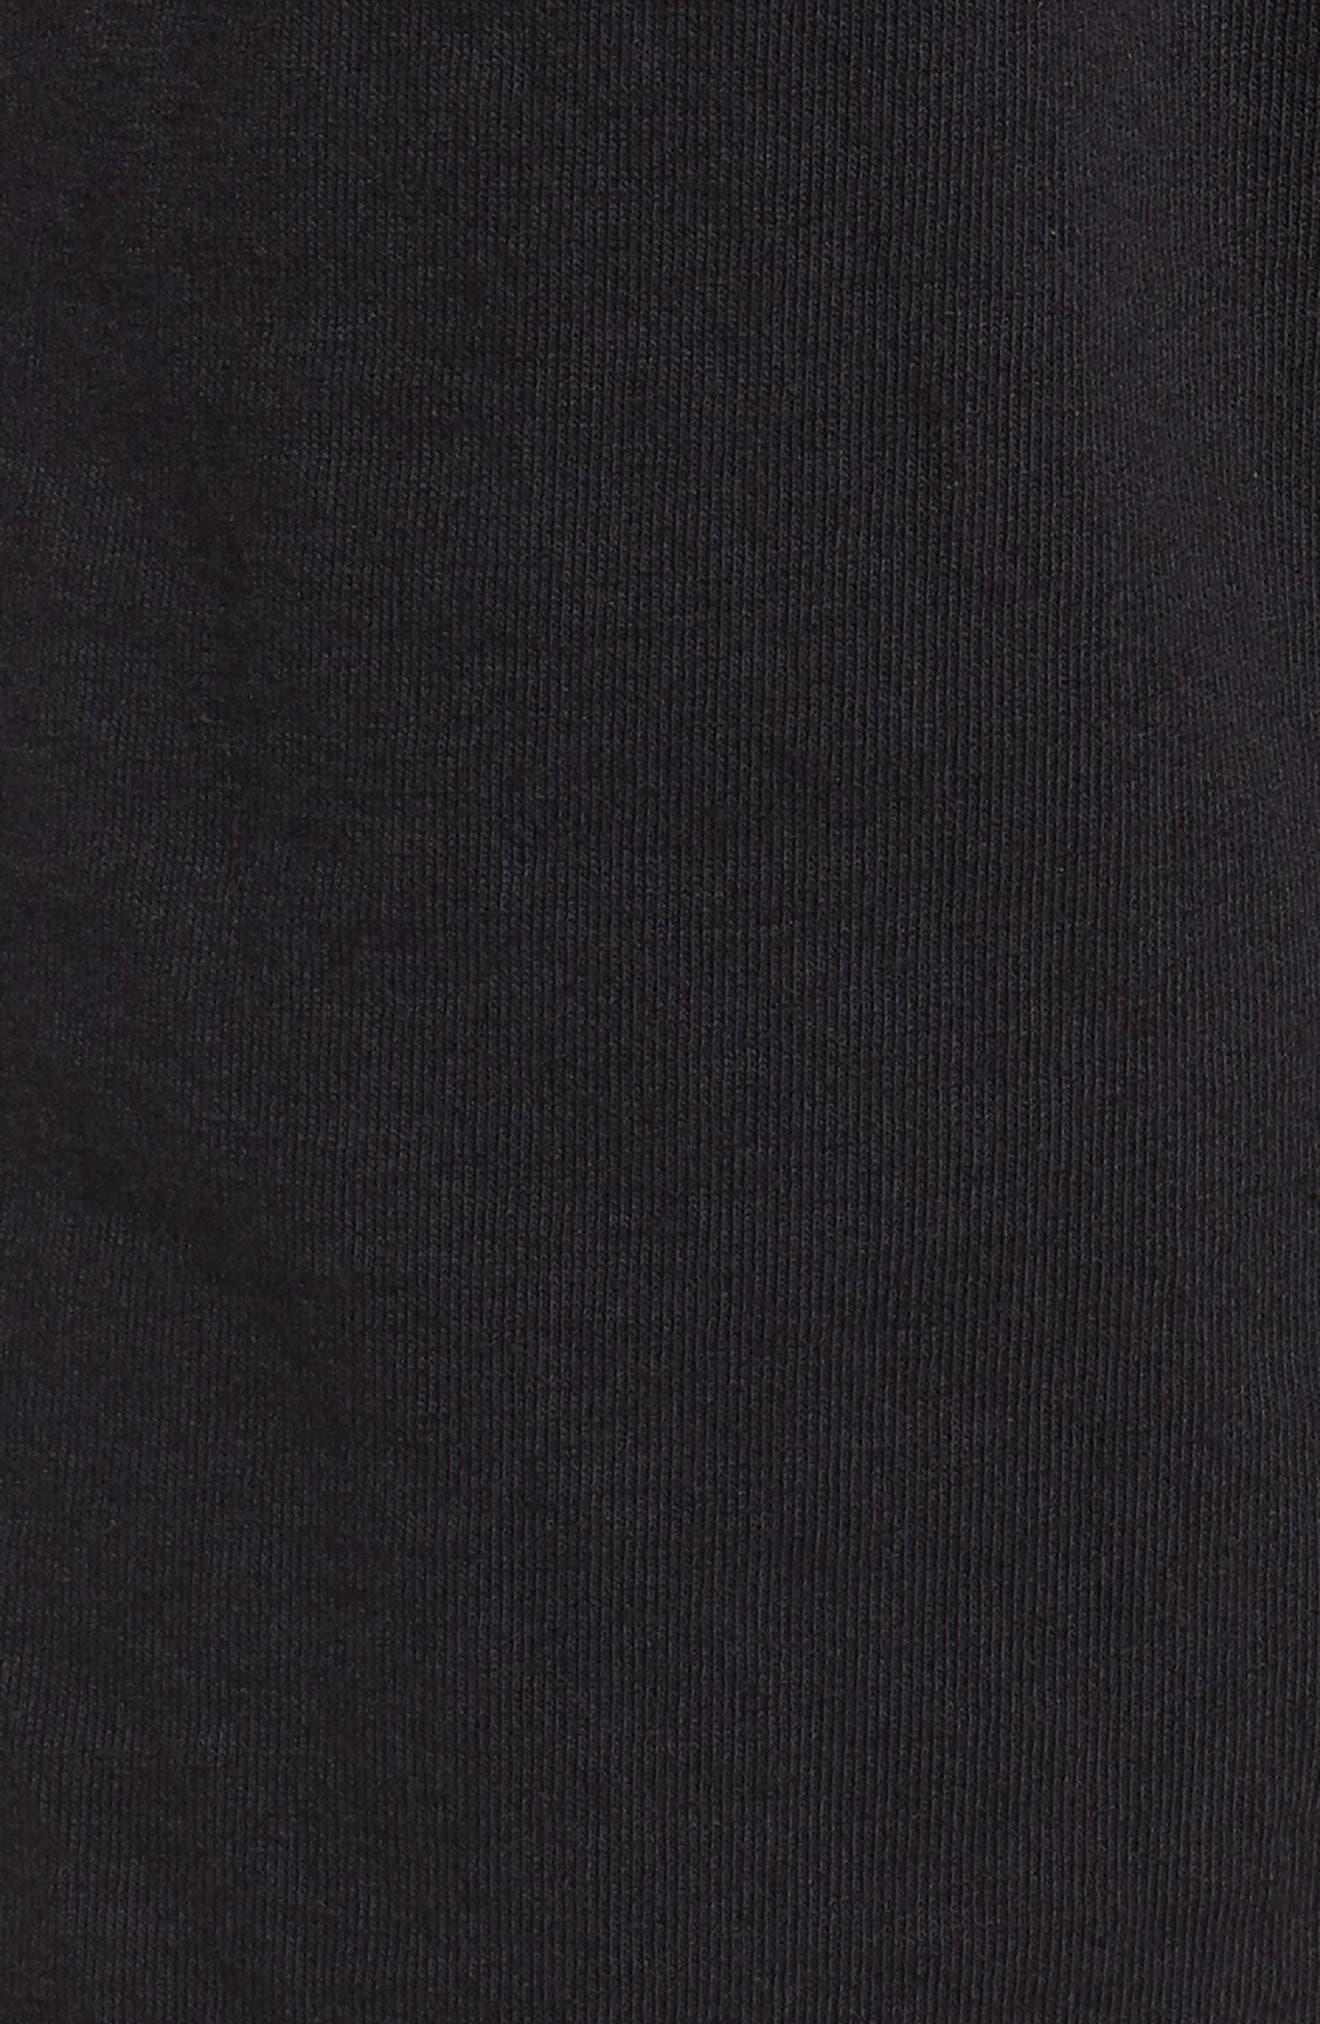 Eyes Heavyweight Sport Shorts,                             Alternate thumbnail 5, color,                             001